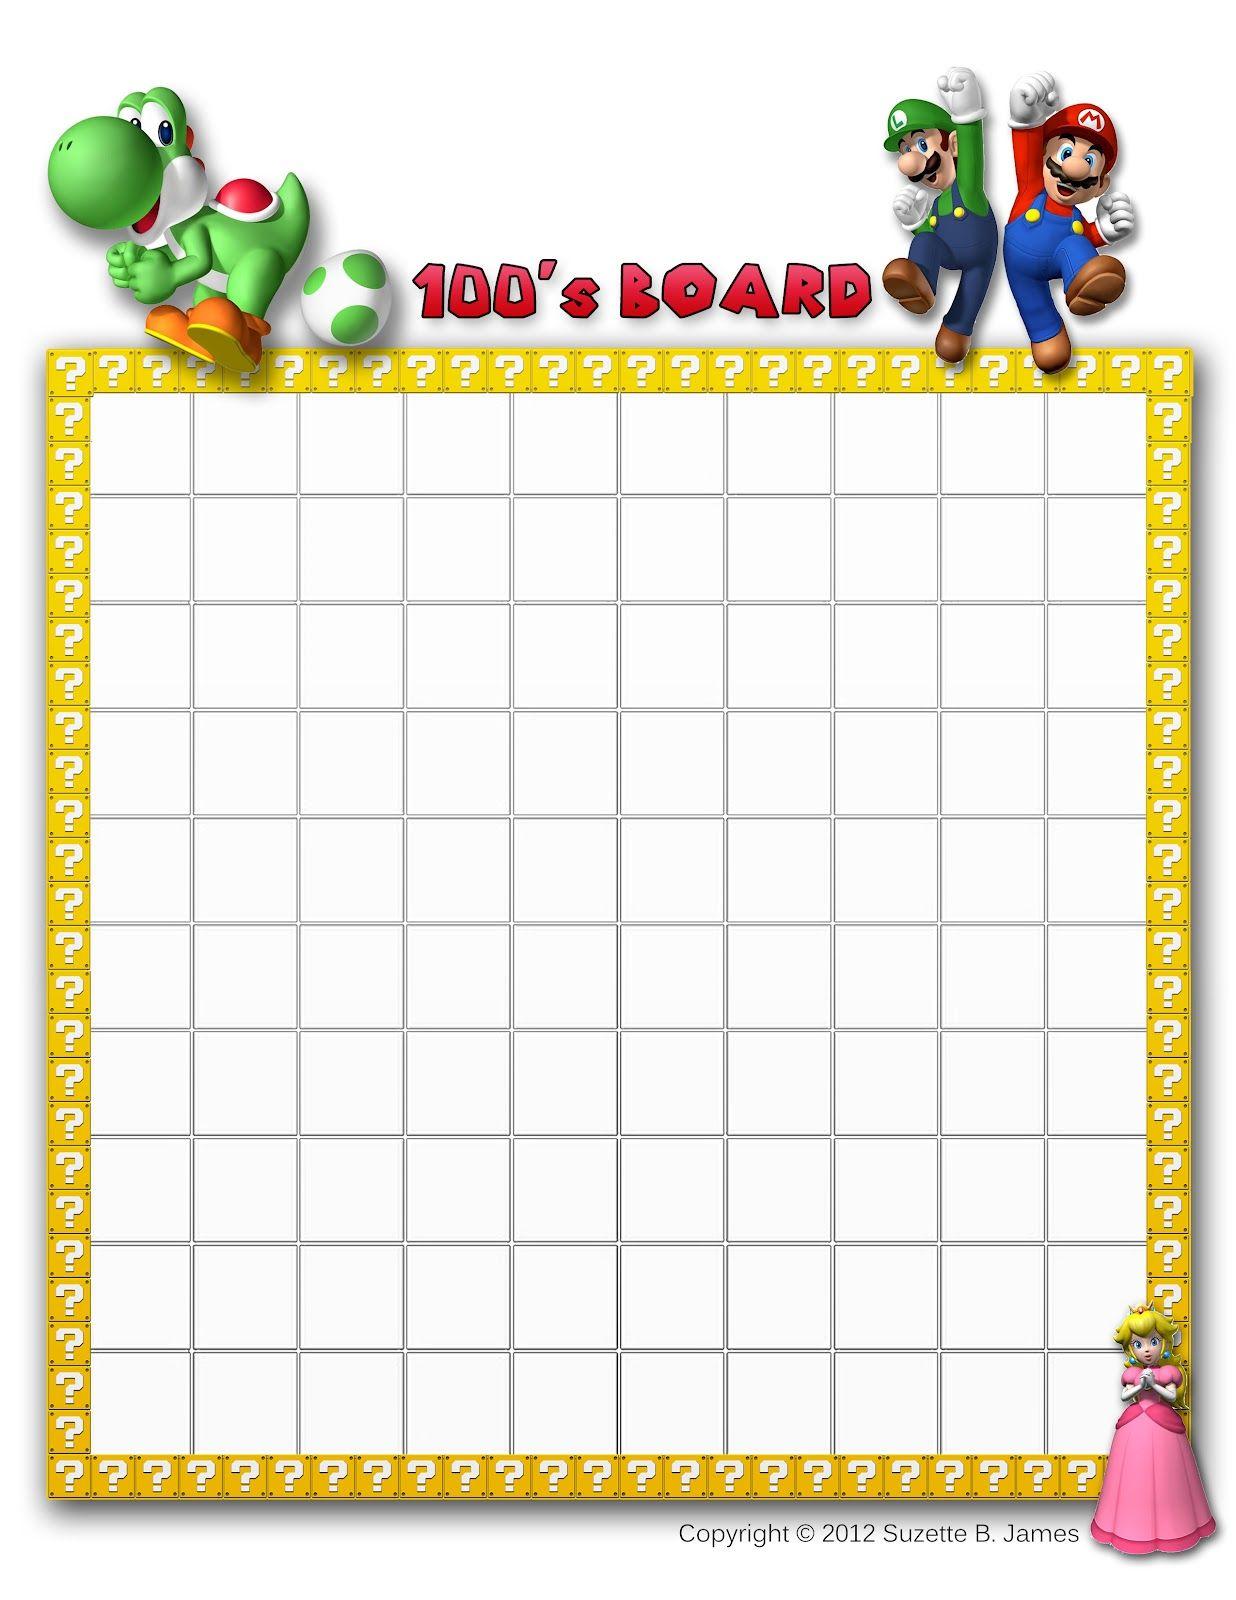 Blank Hundreds Board Template